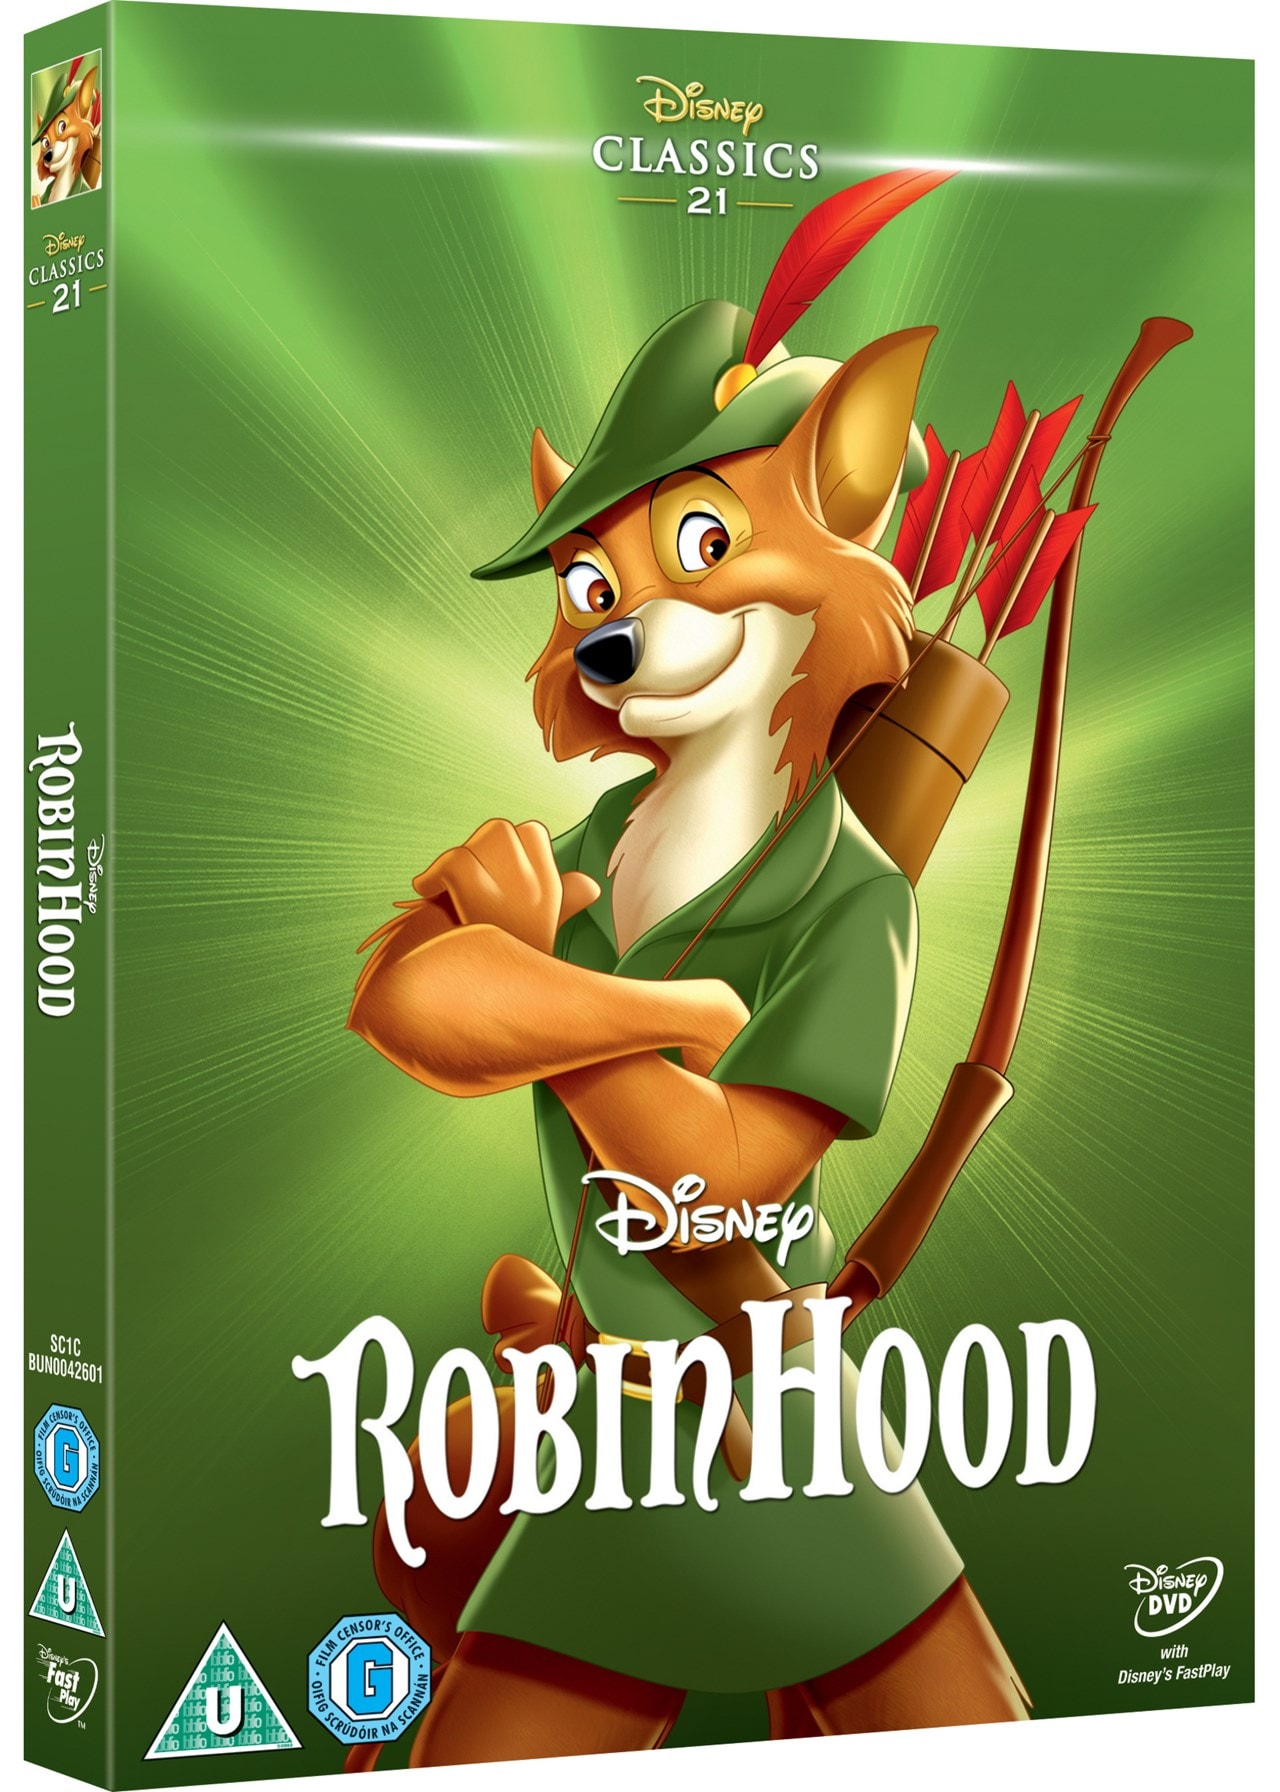 Robin Hood (Disney) - 2